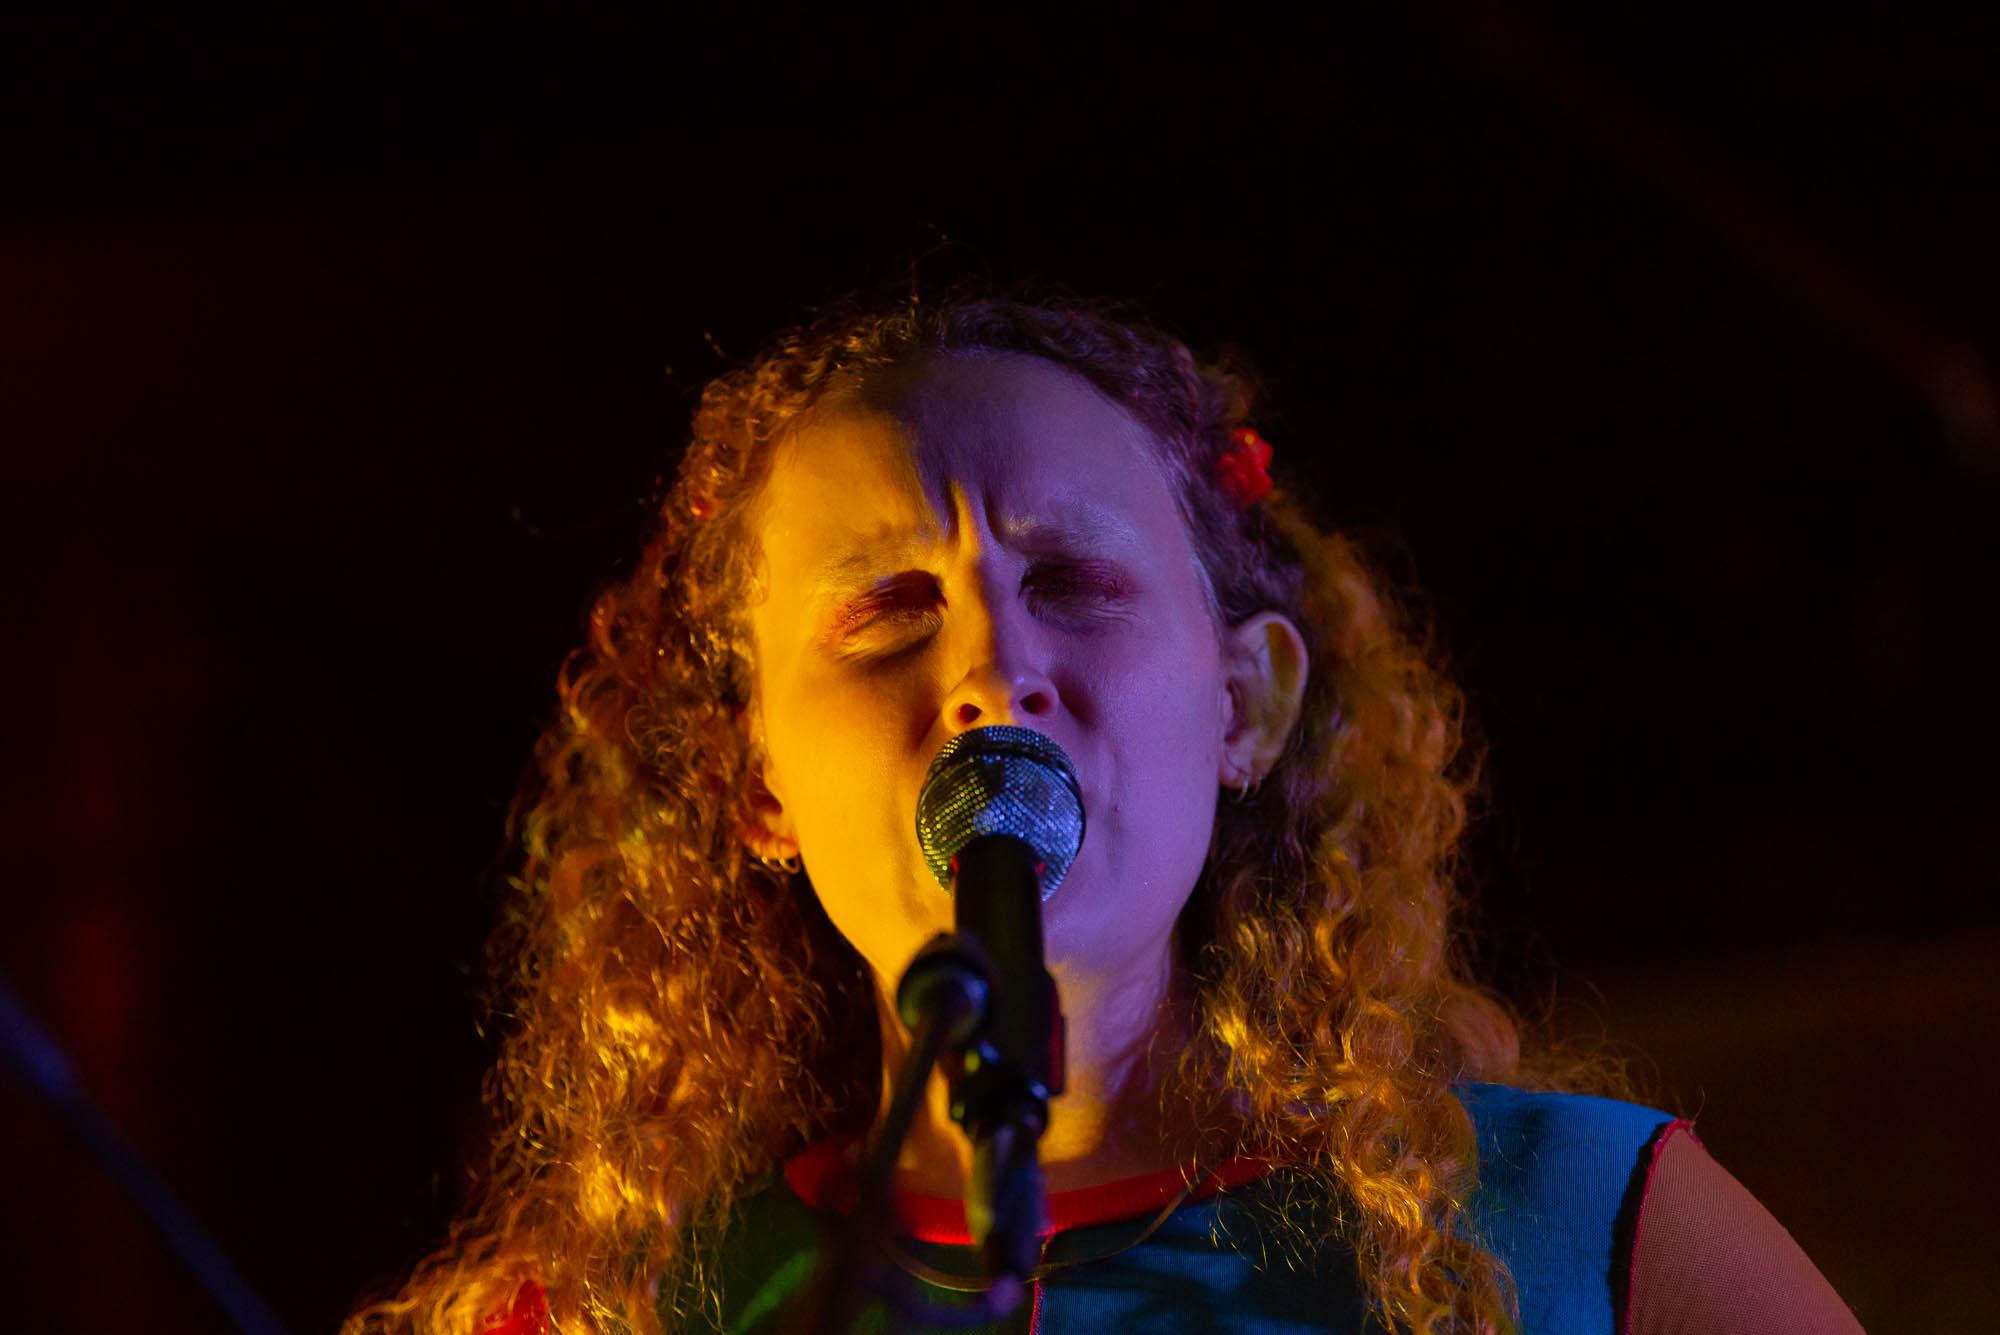 Natasha Jacobs of Thelma performing at Market Hotel on Friday, October 4, 2019.